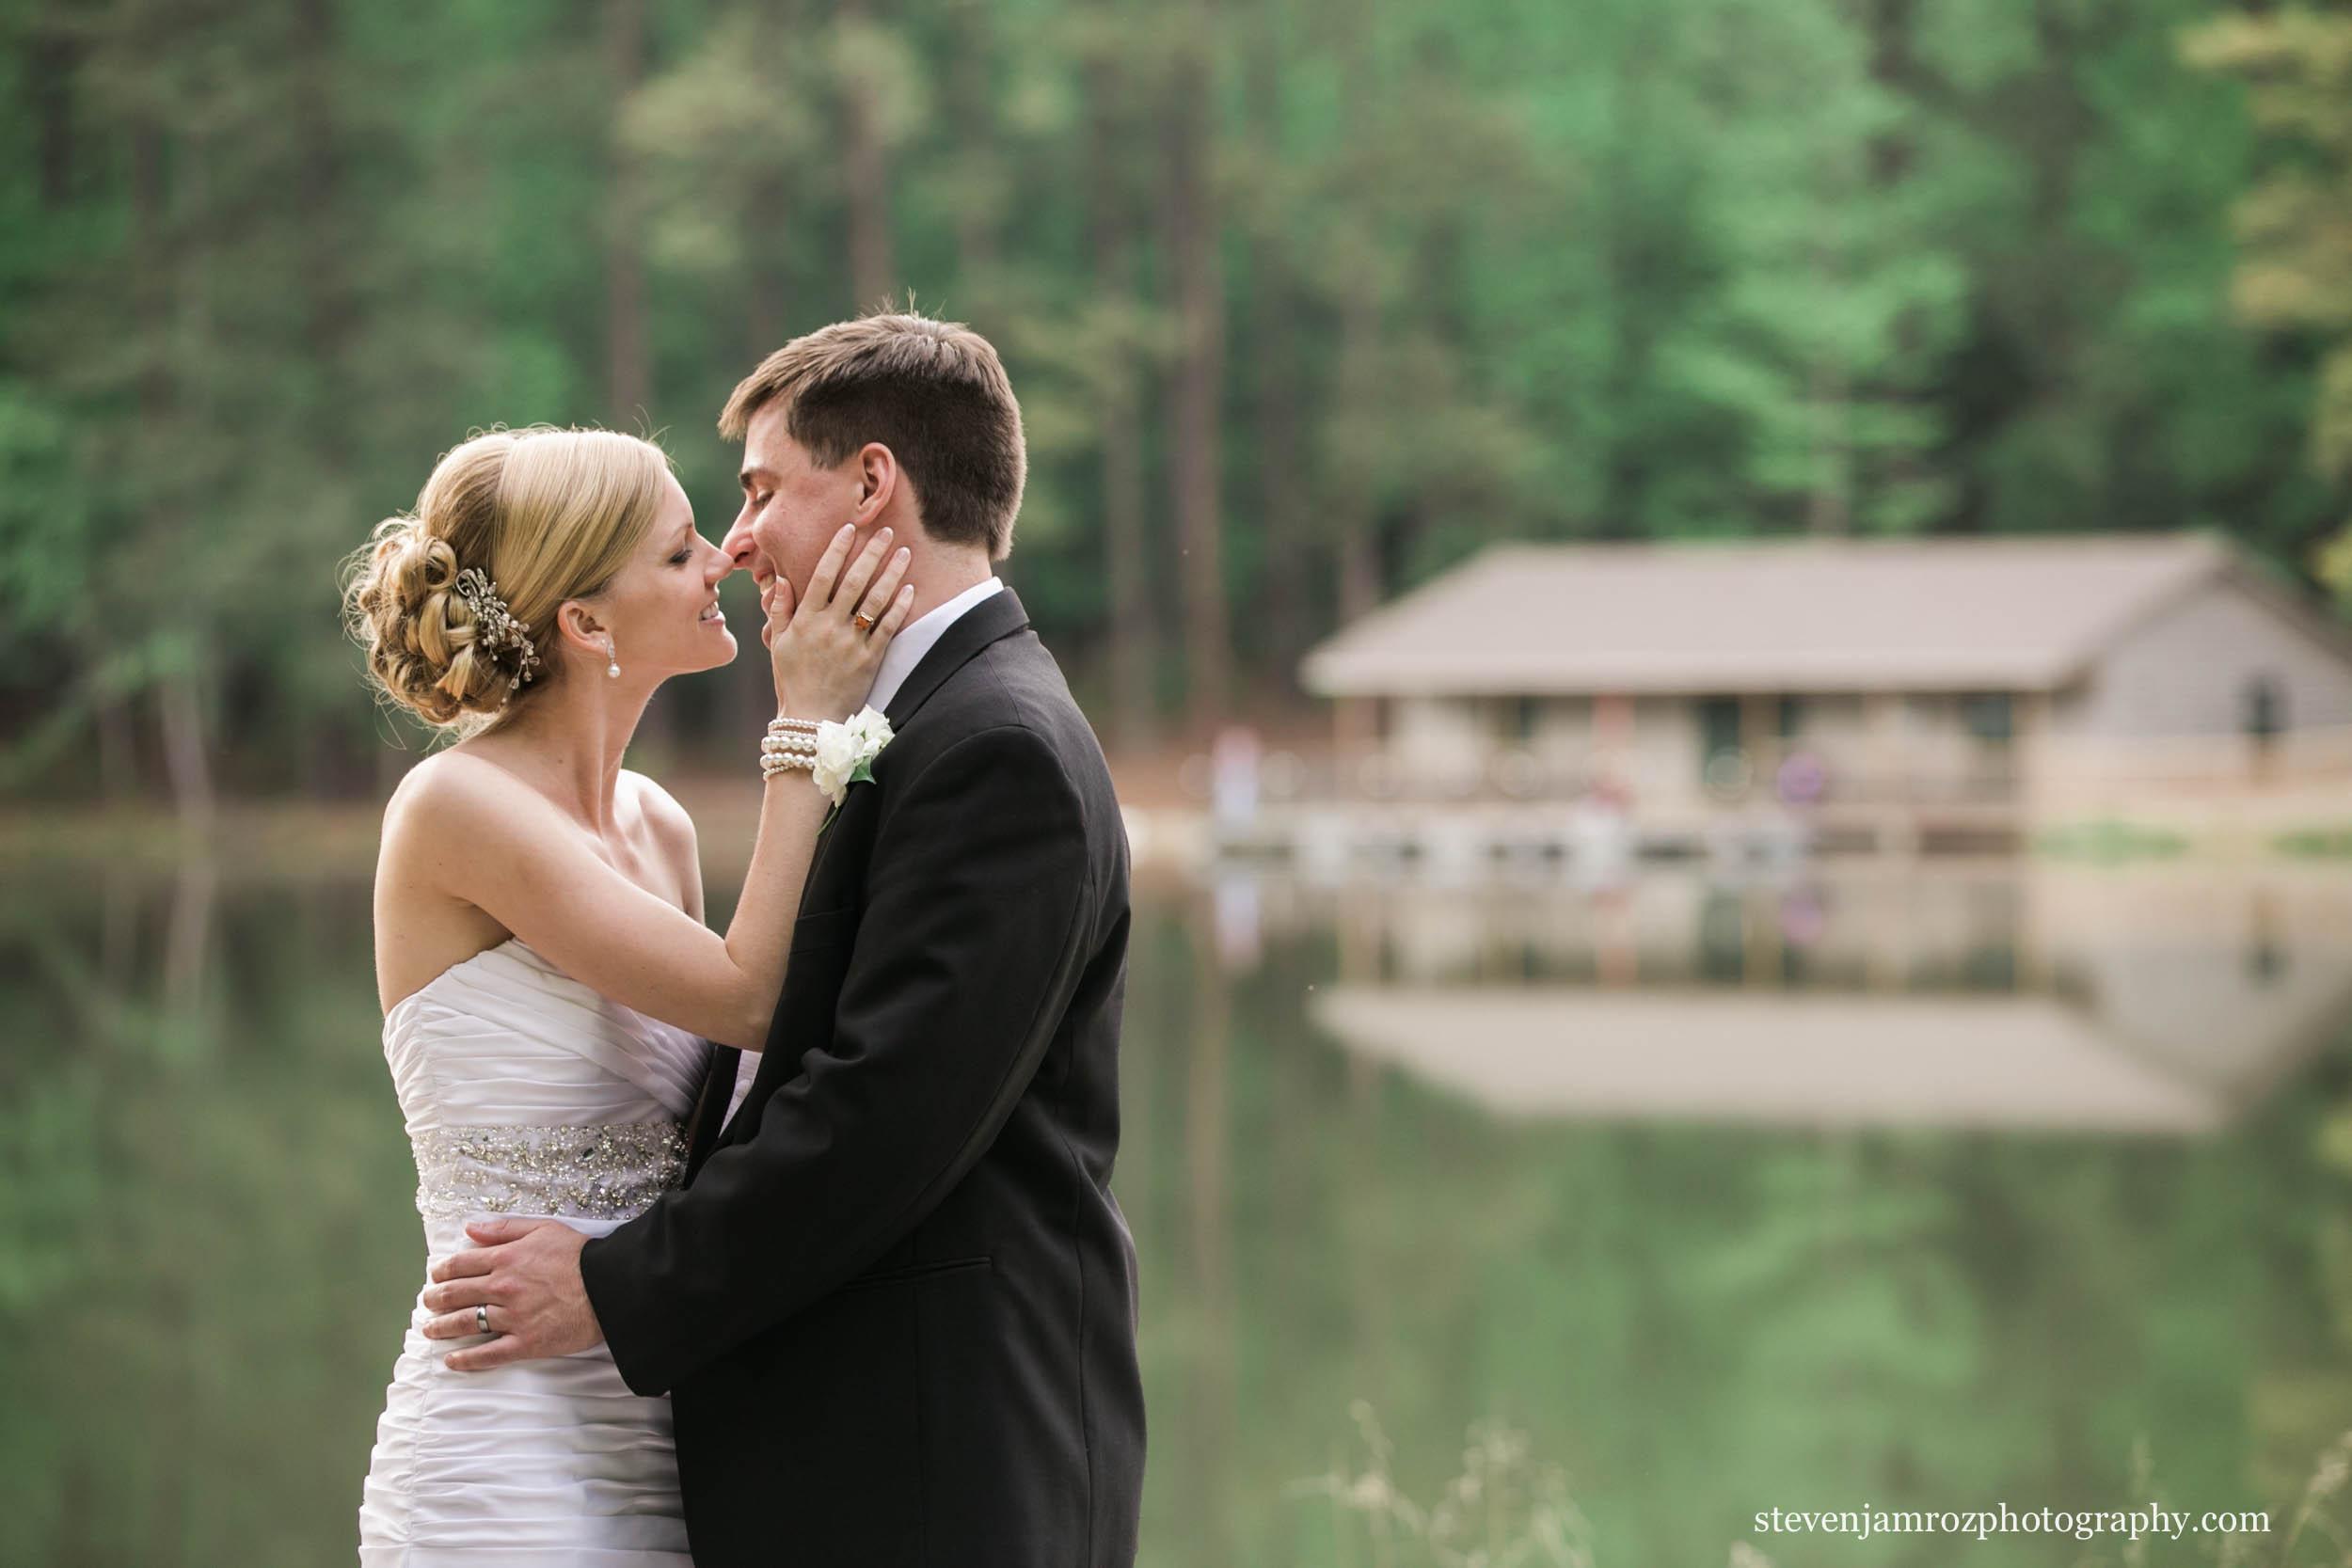 nc-wedding-kiss-raleigh-steven-jamroz-photography-0573.jpg